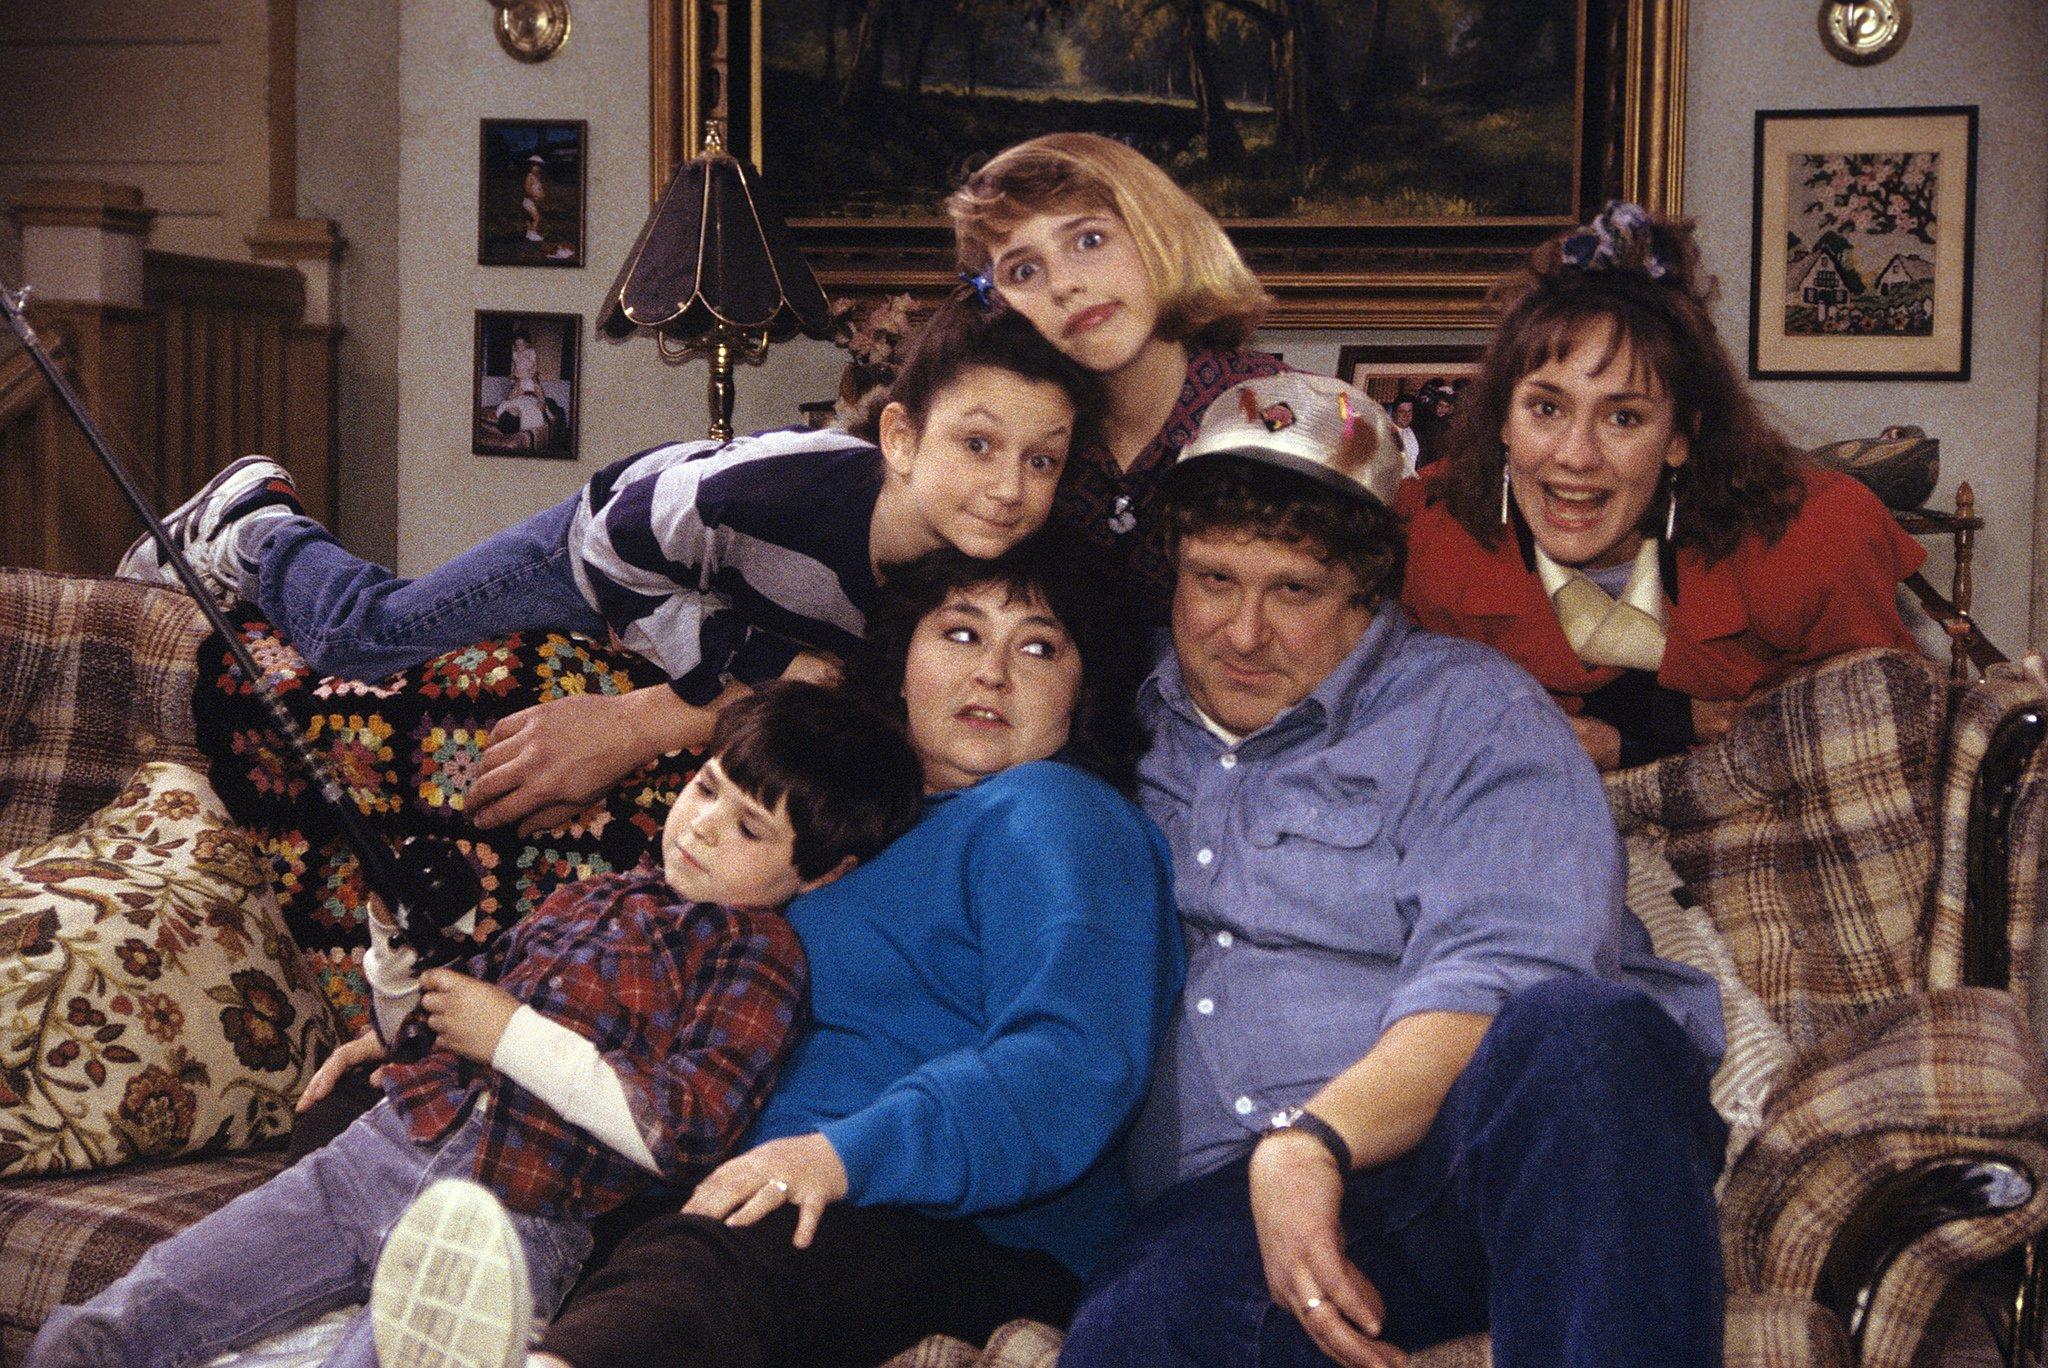 ROSEANNE comedy series sitcom television 1 wallpaper 2048x1368 2048x1368